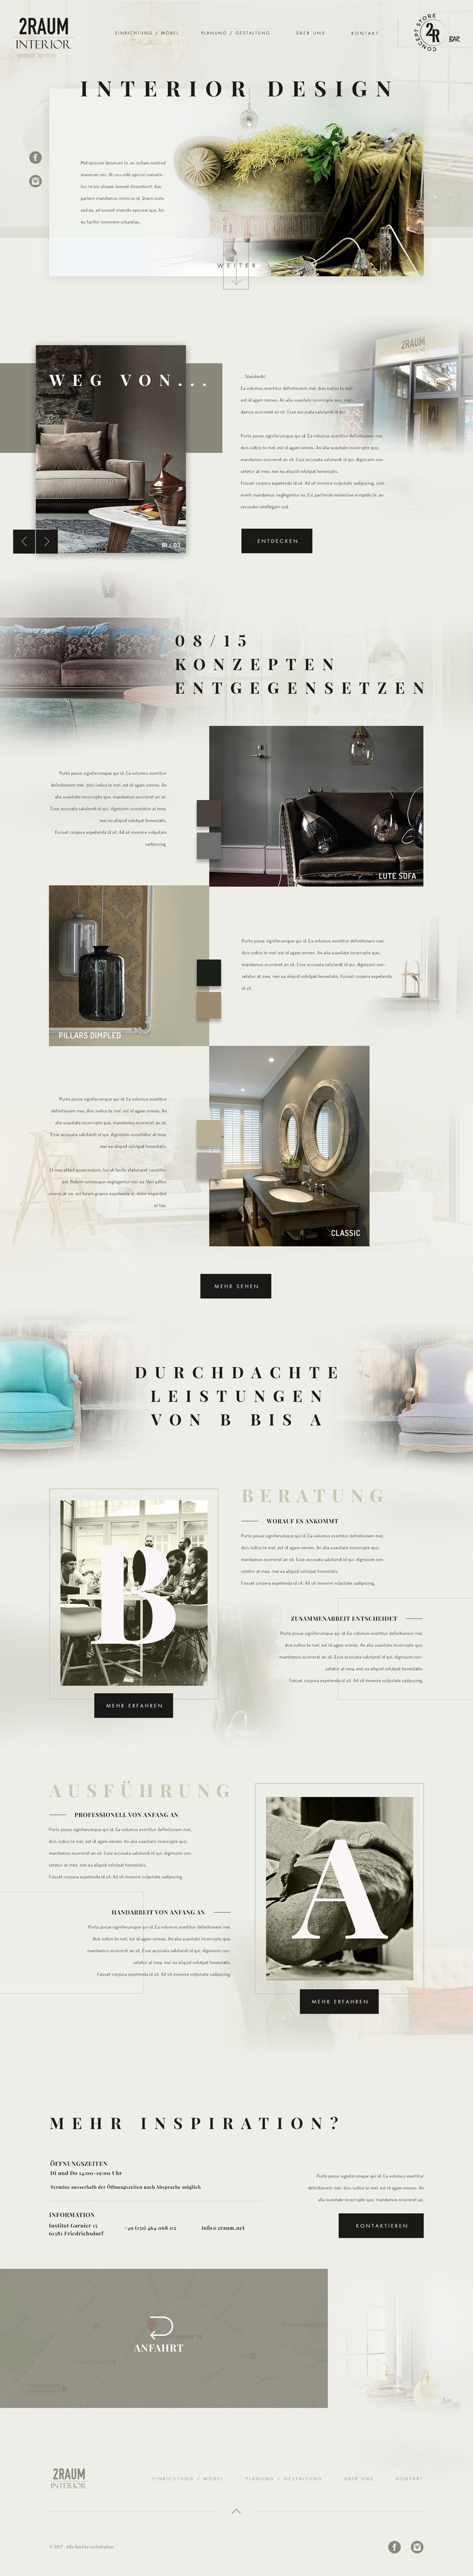 Best 25 Interior Design Portfolios Ideas On Pinterest Portfolio Design Portfolio Cover